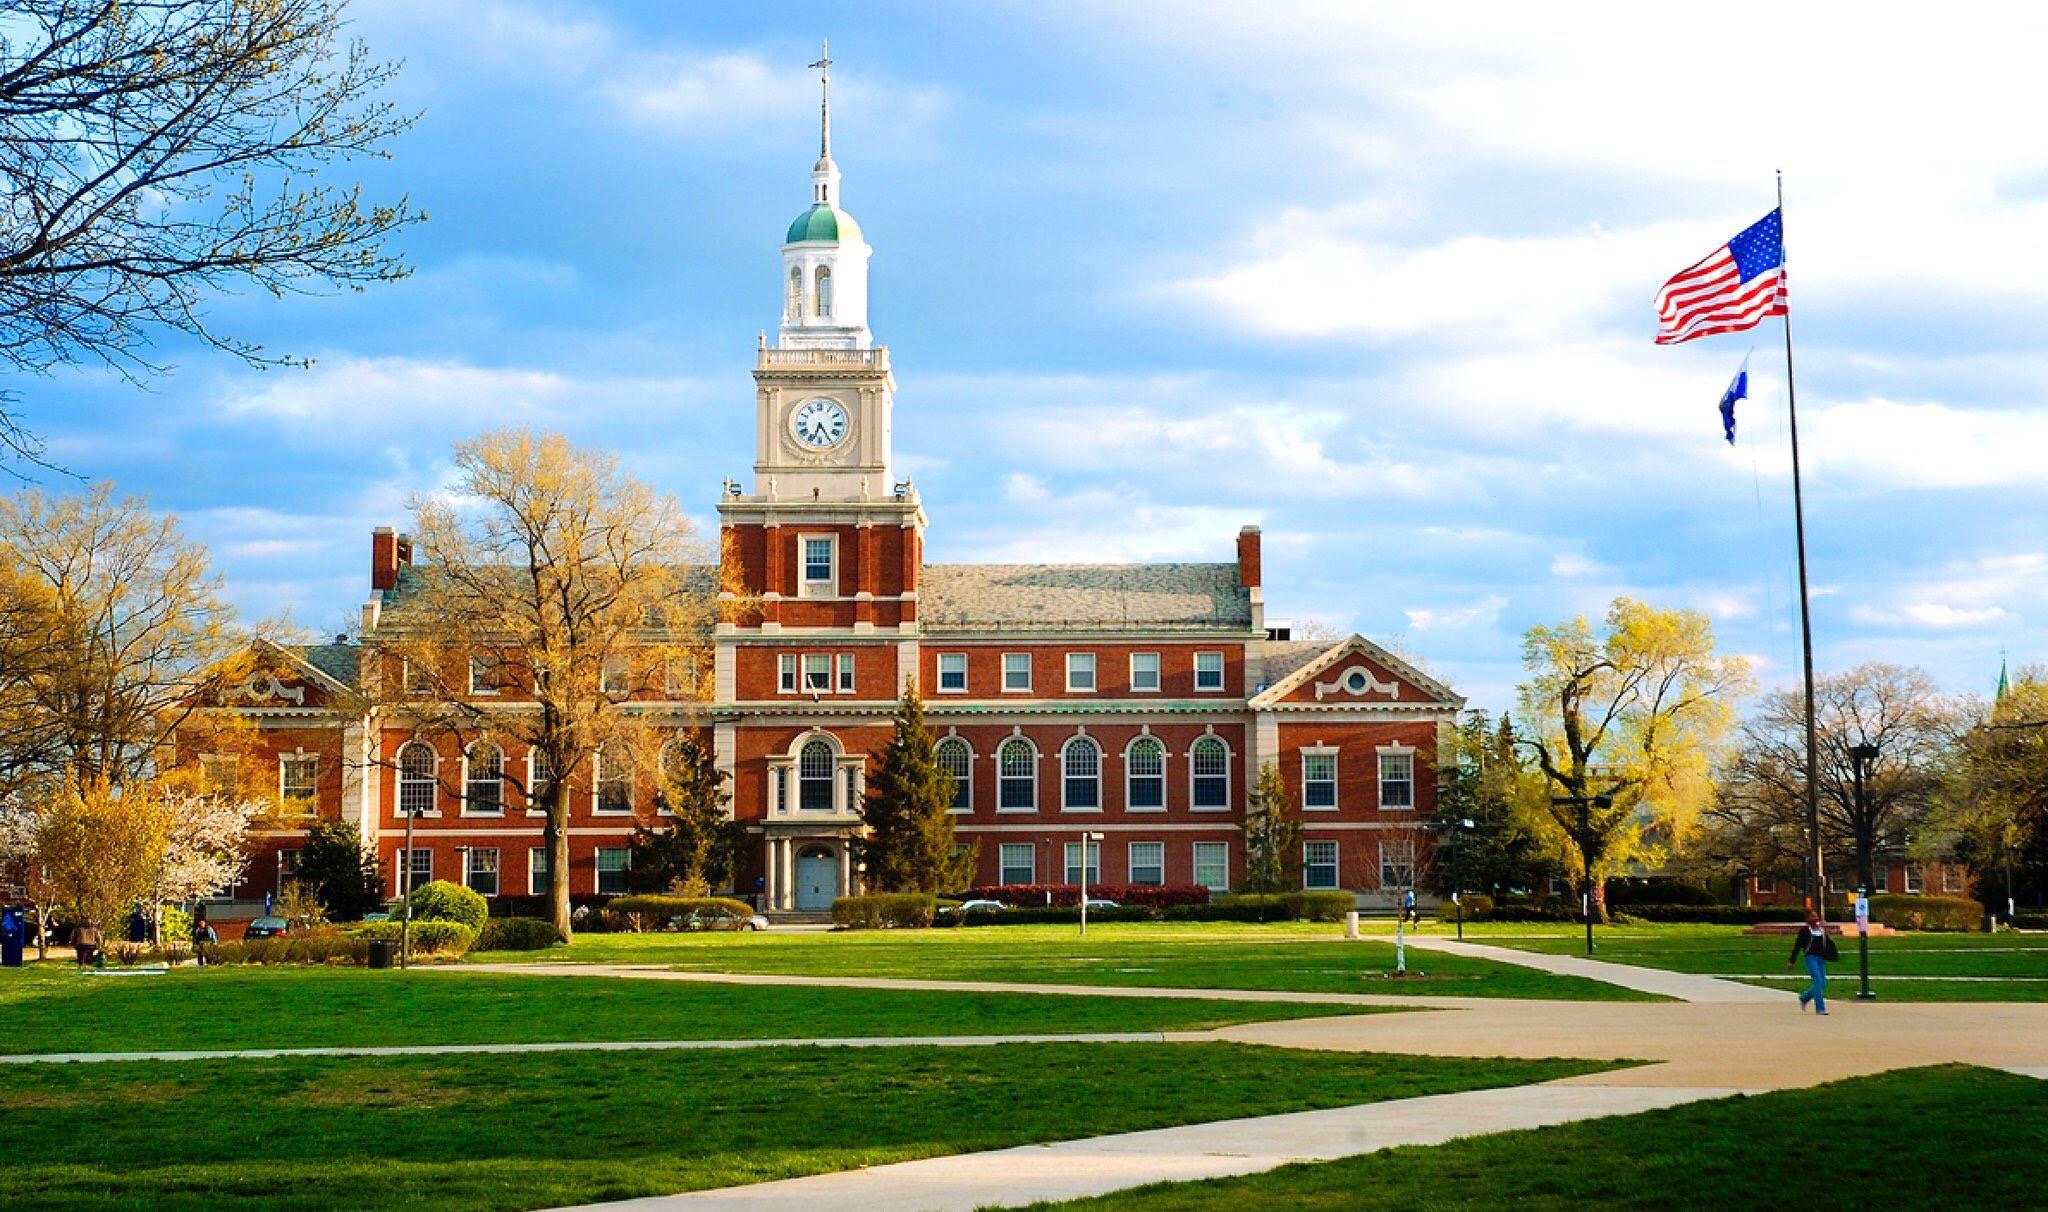 Tyrone-Hankerson-Howard-University-Financial-Aid-Scandal